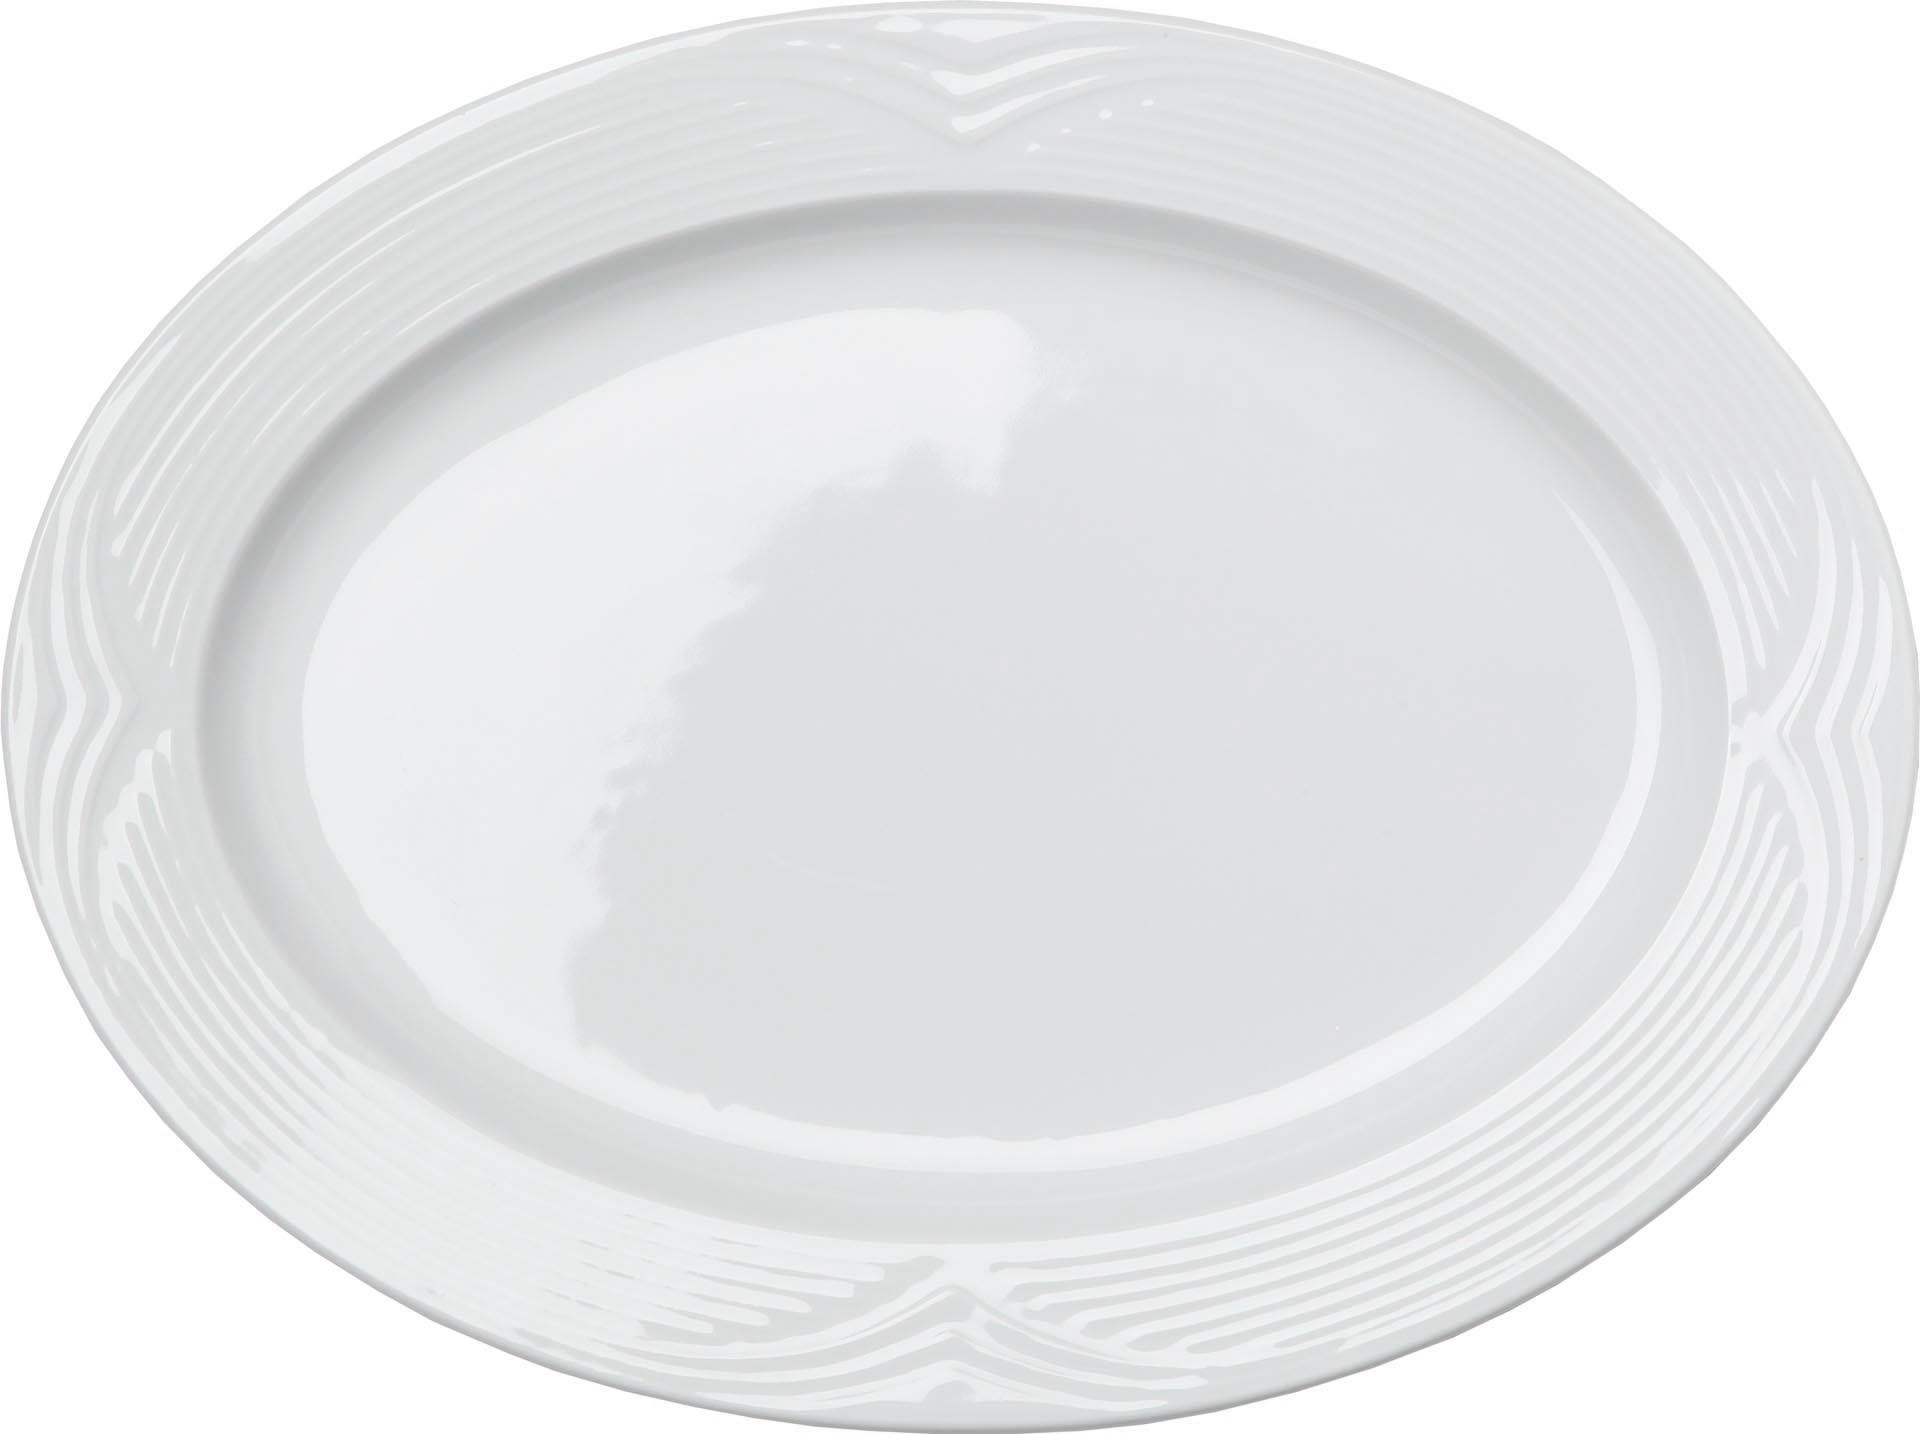 "Platte oval ""Saturnia"" 34 x 24 cm Hotelporzellan"